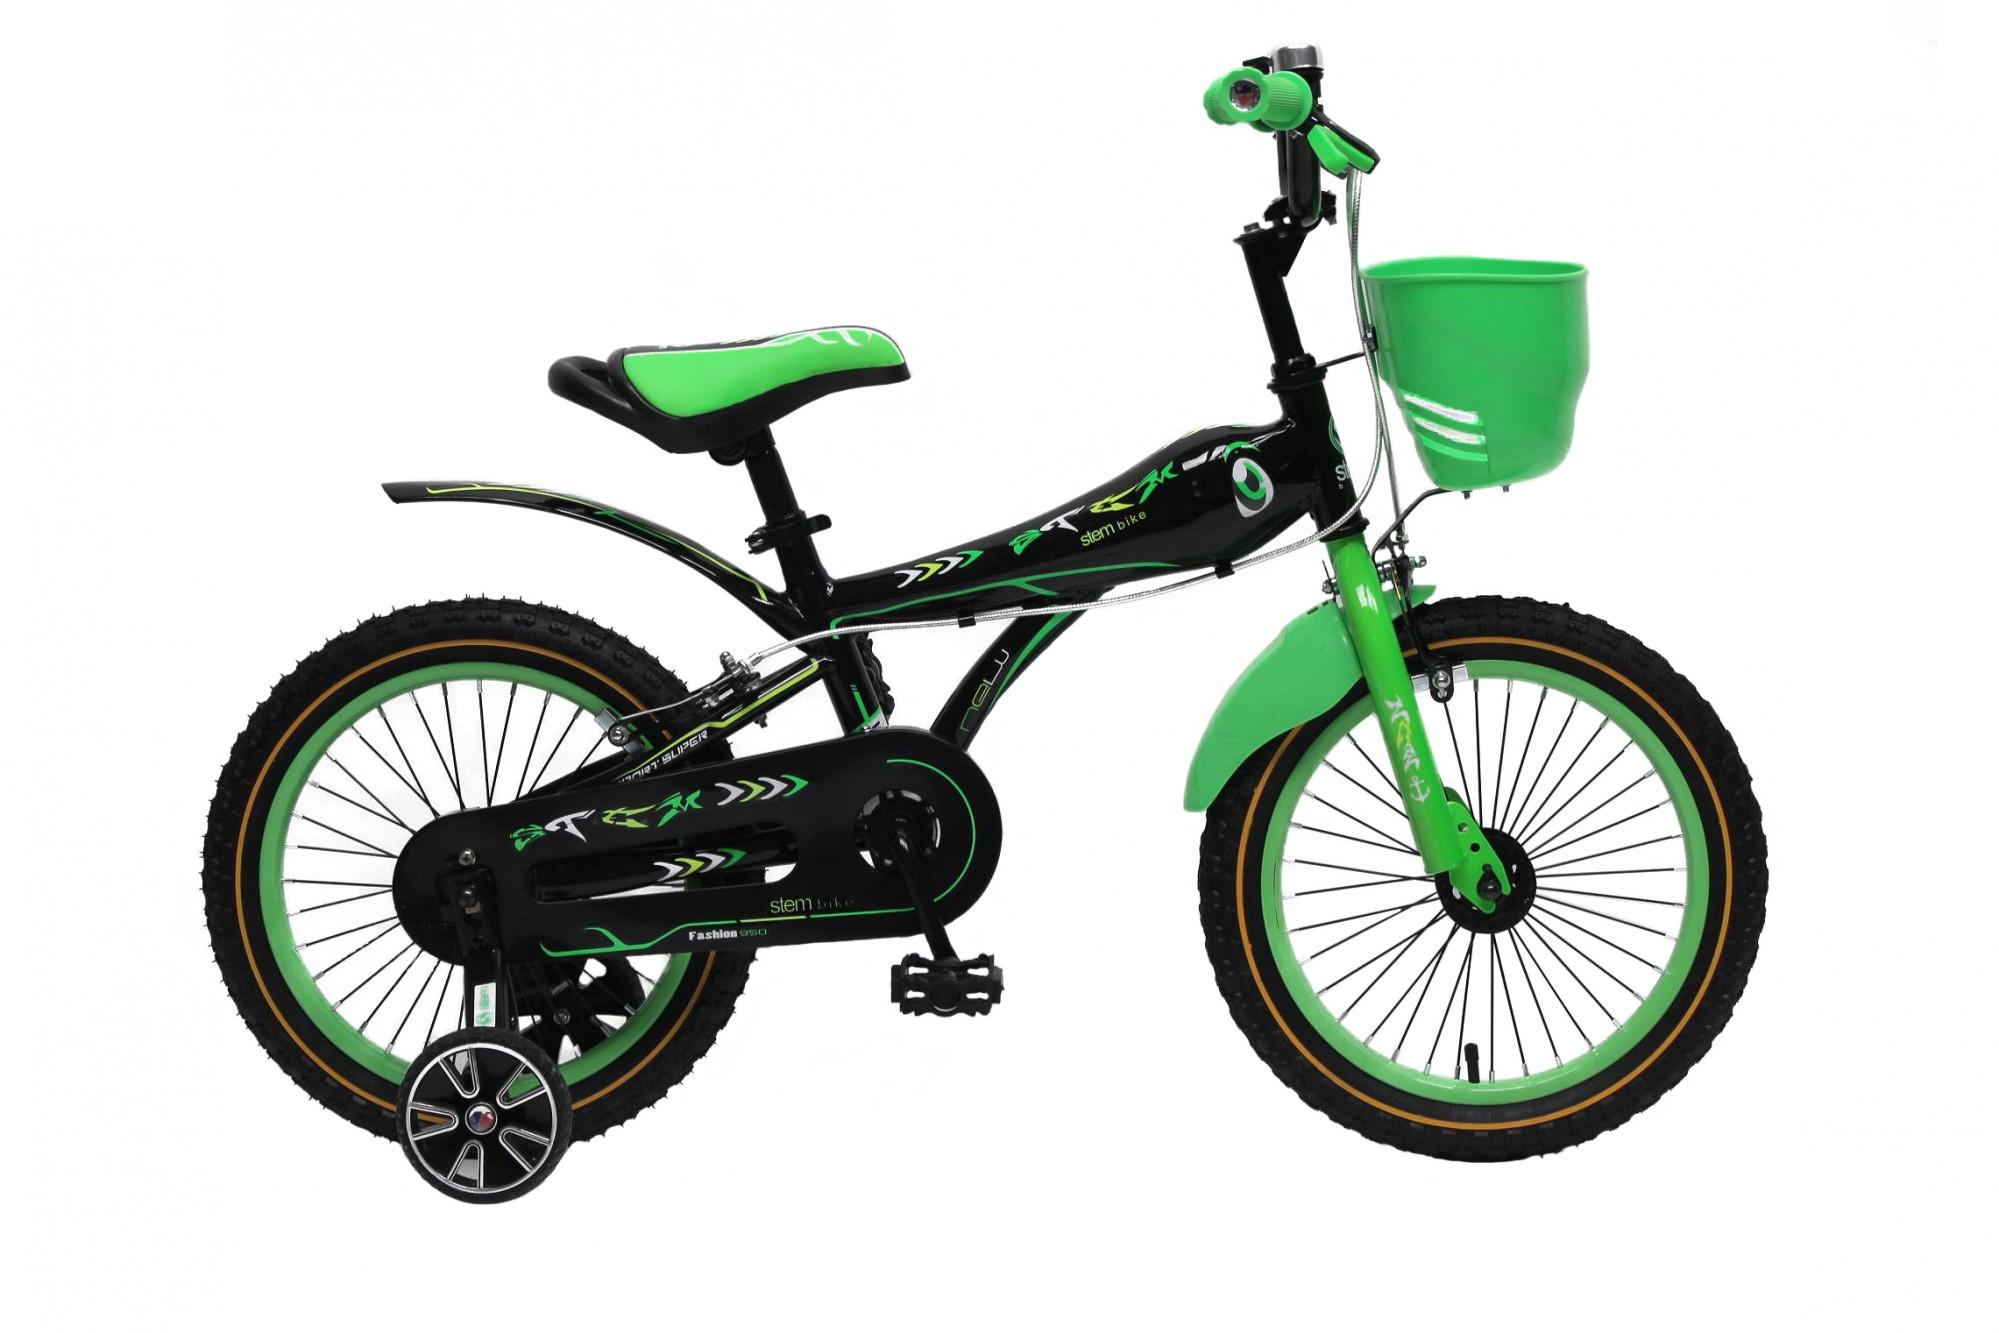 kinderfahrrad 16 zoll kinder fahrrad spielrad rad bmx gr n. Black Bedroom Furniture Sets. Home Design Ideas